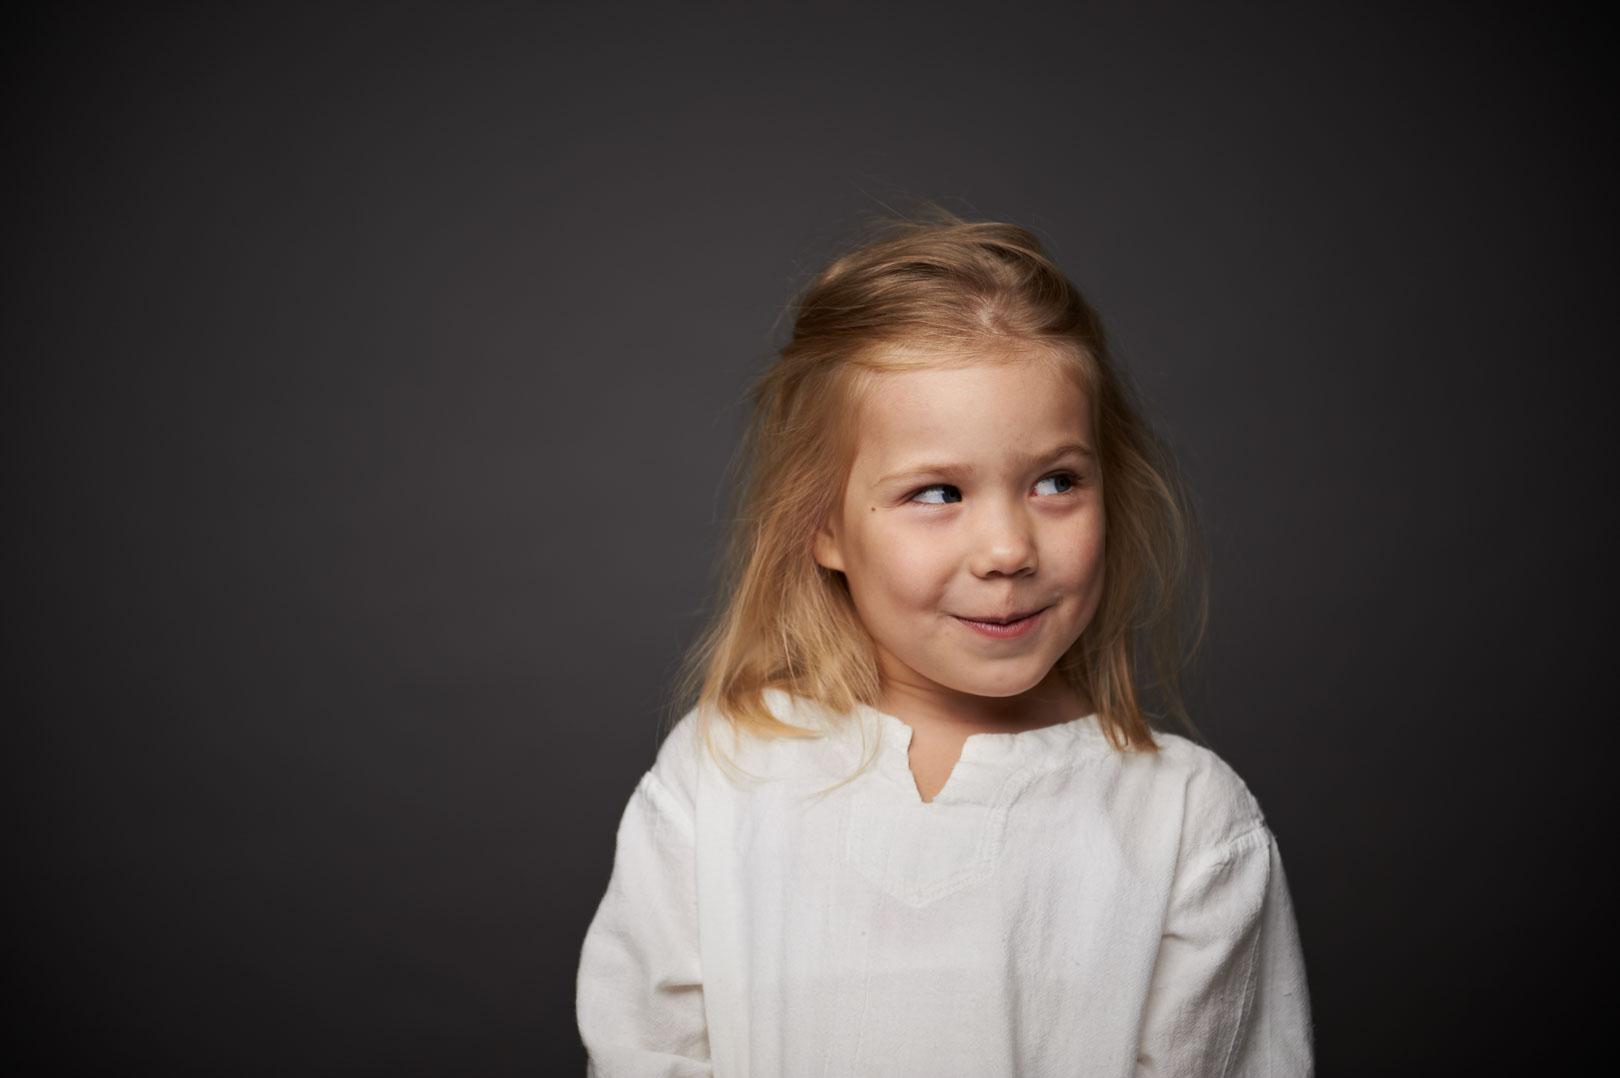 Gahlert Tochter 0732